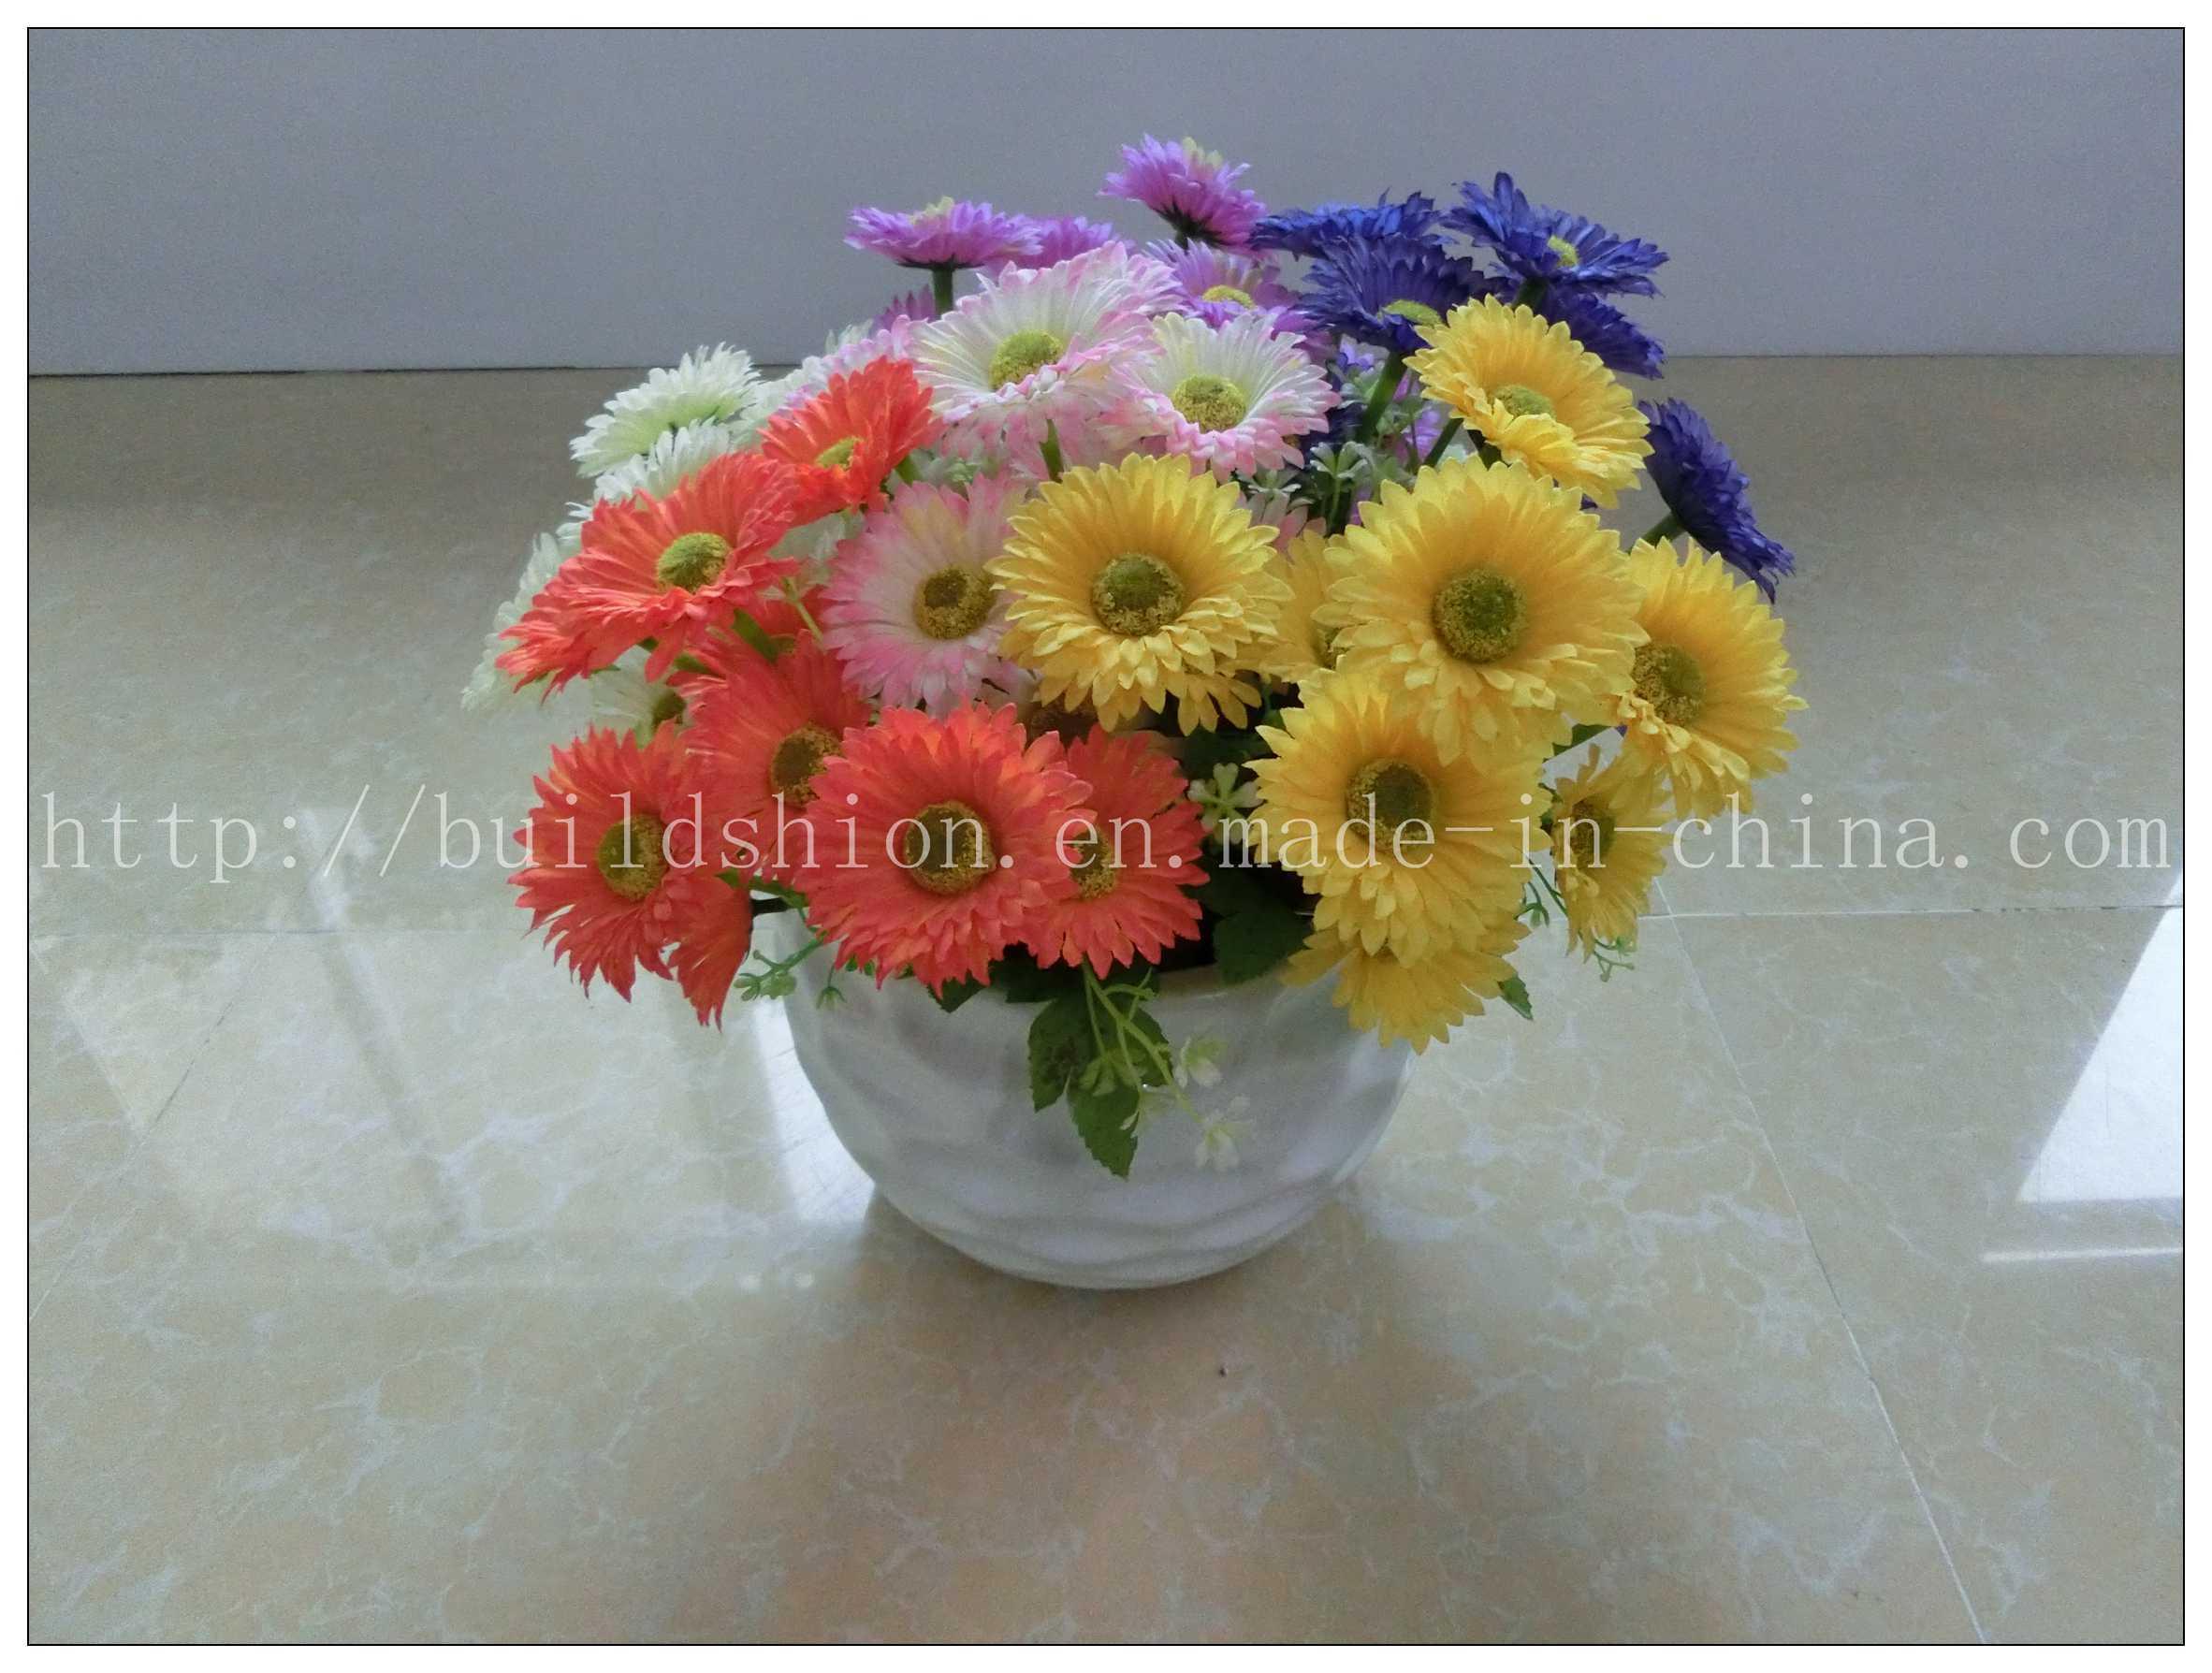 China Cheap Decoration Artificial Flower Manufacturer Bh51007